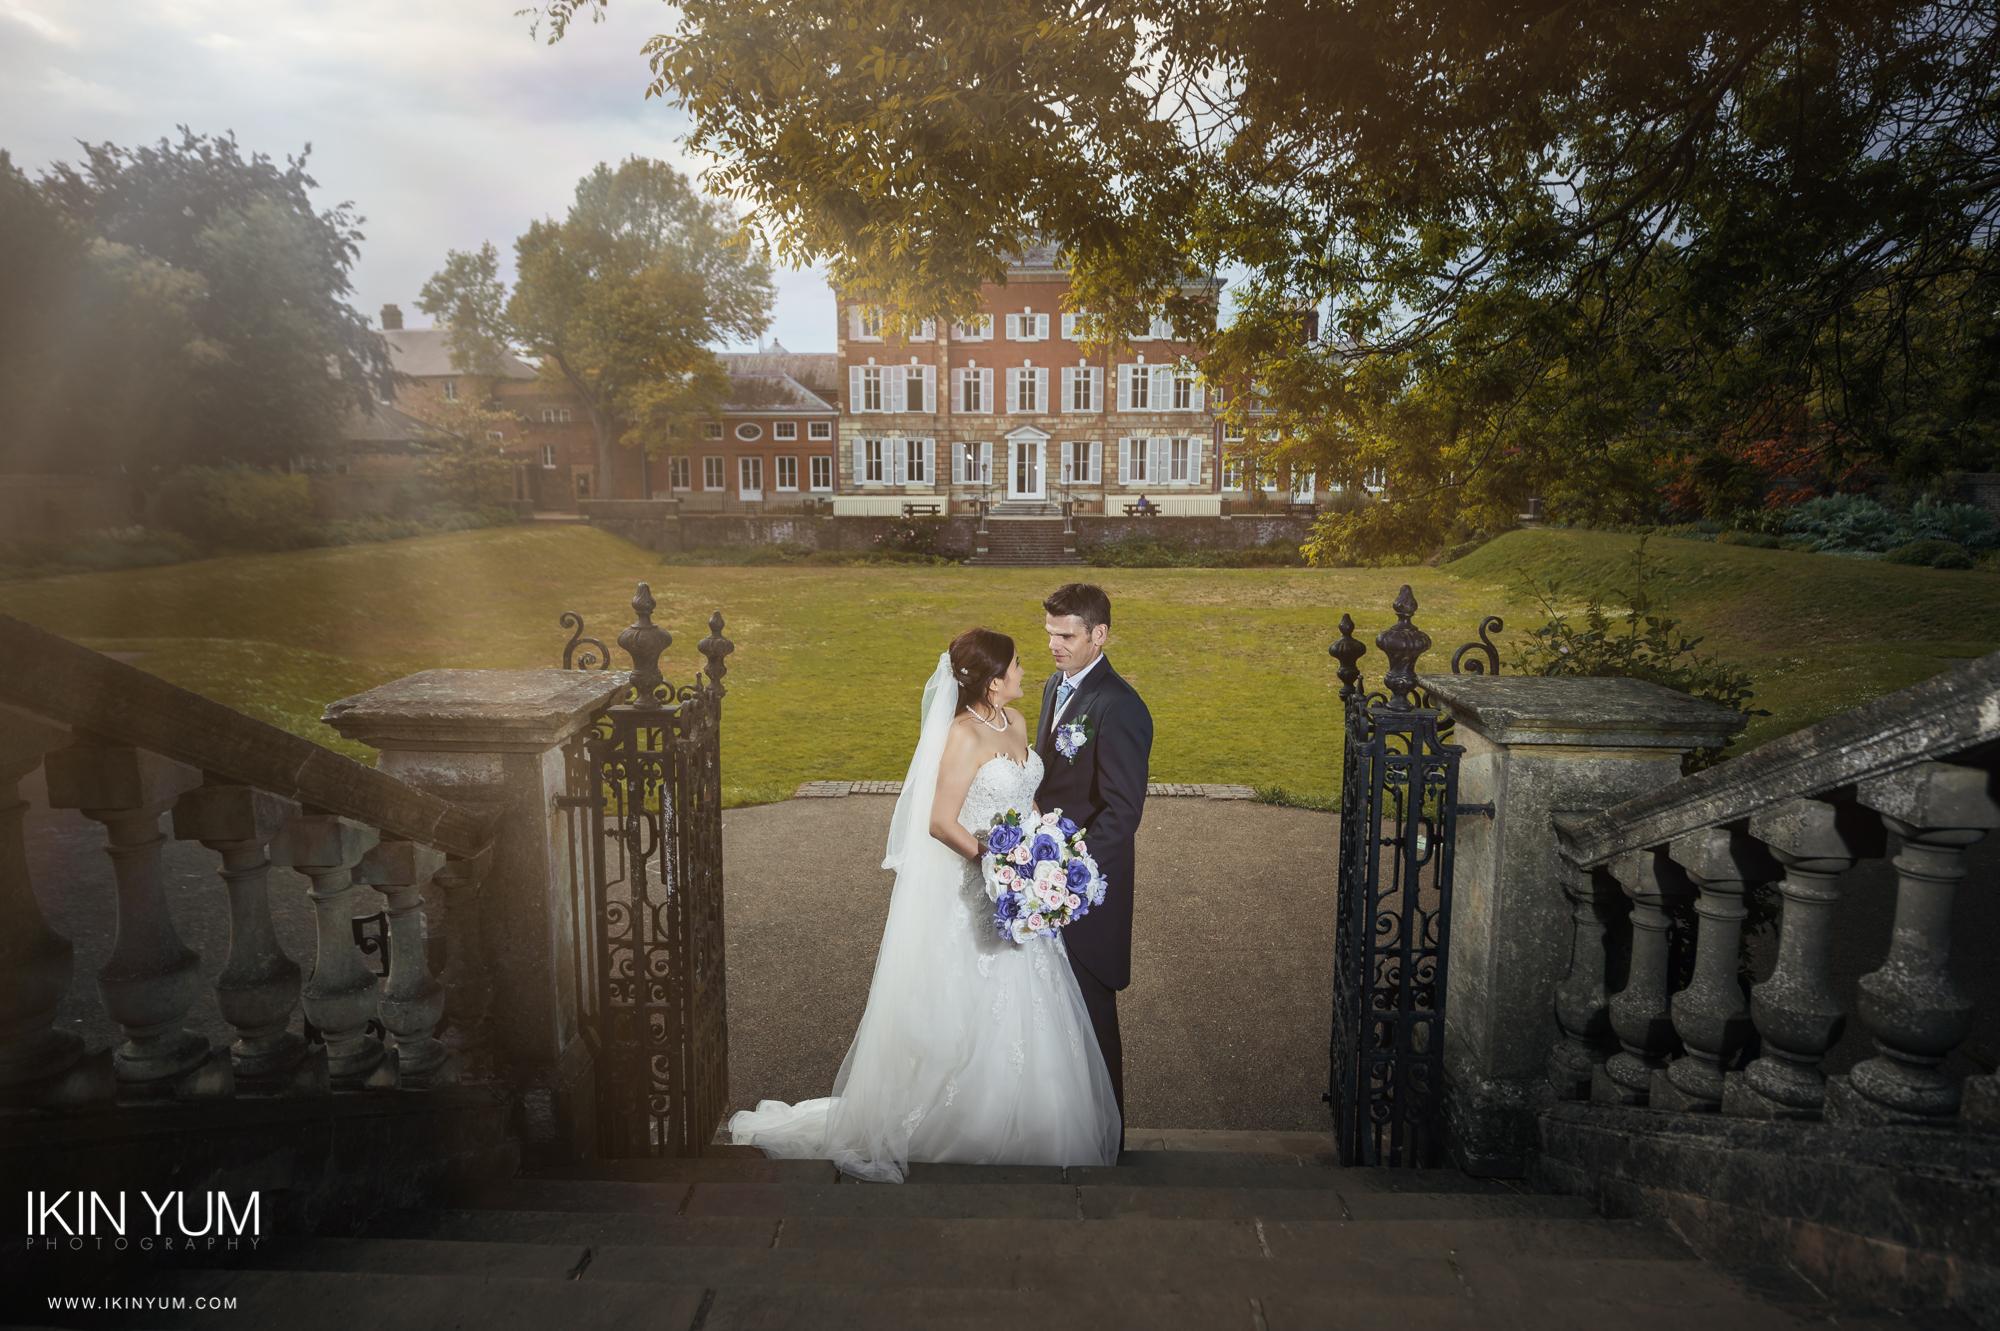 Teresa & Johnathan Weddong Day - Couple Photoshoot-0066.jpg